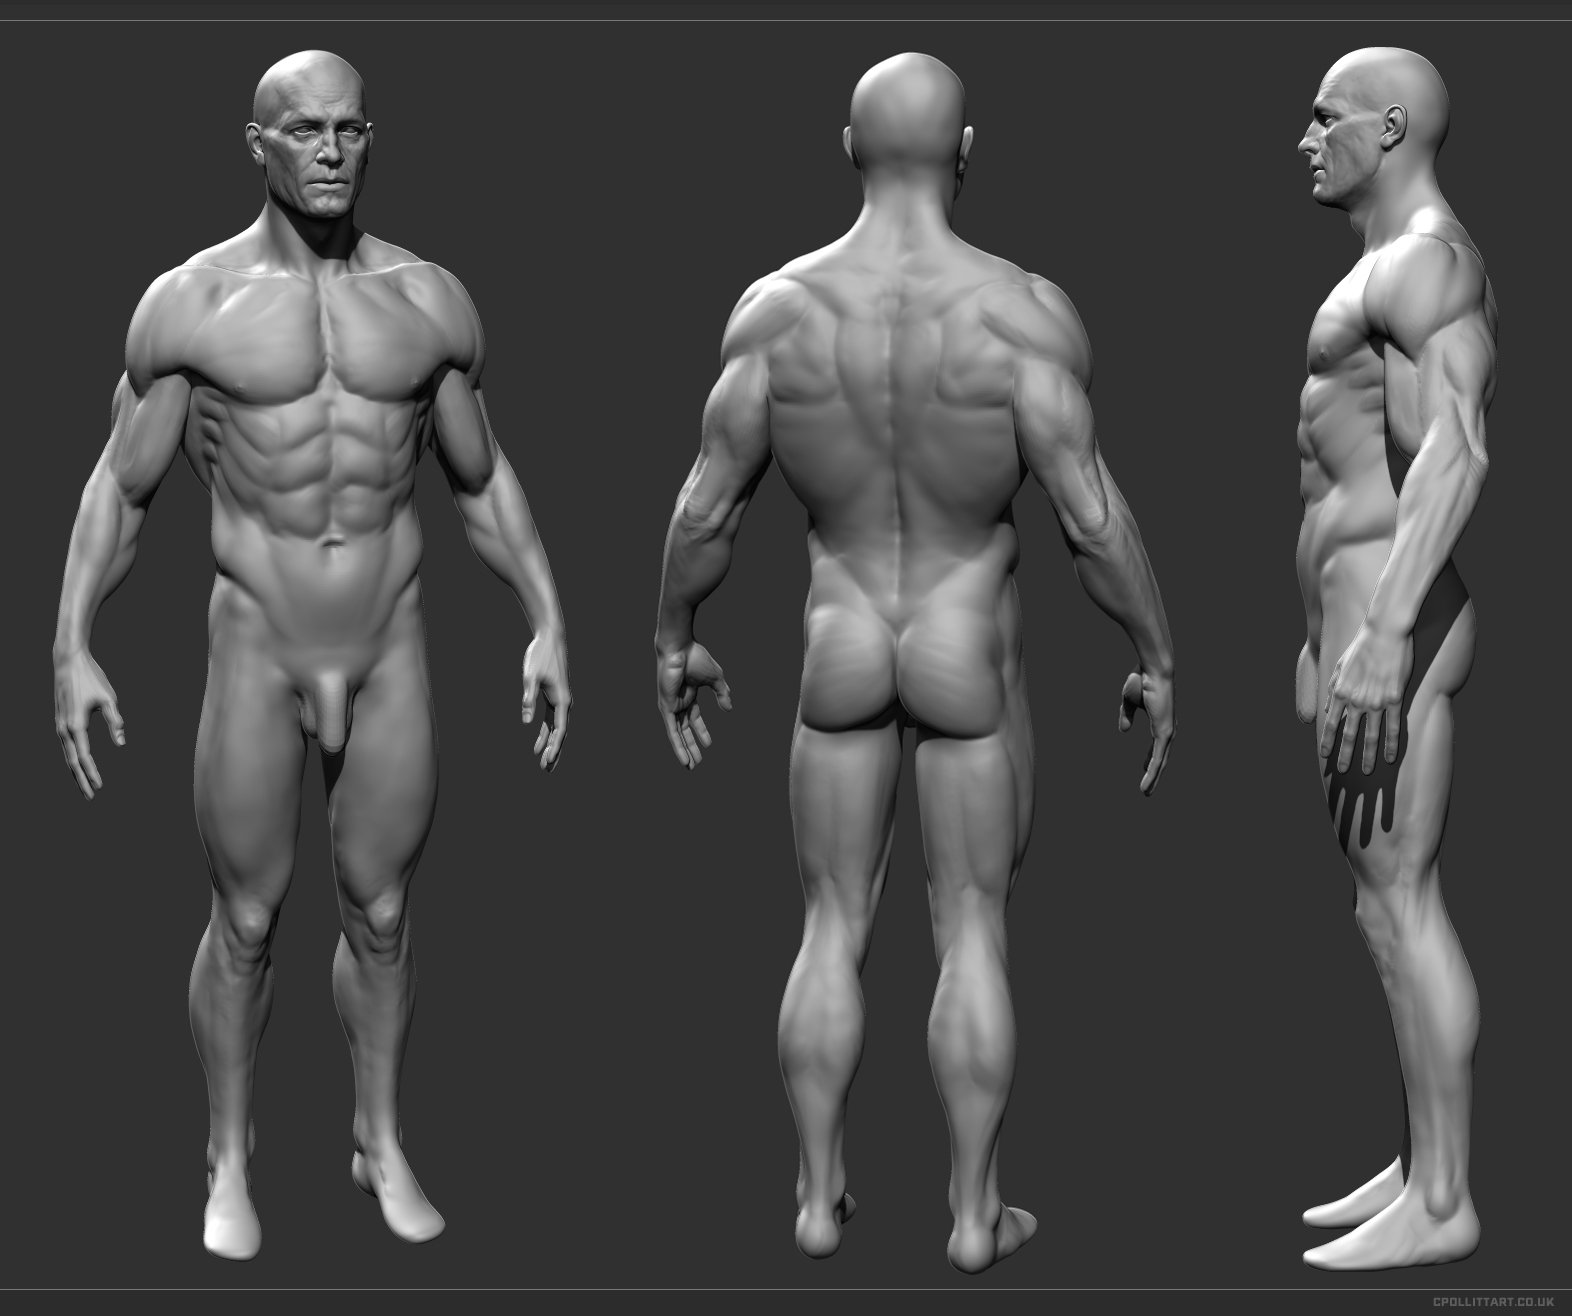 ArtStation - Mr Generic Anatomy, Chris Pollitt